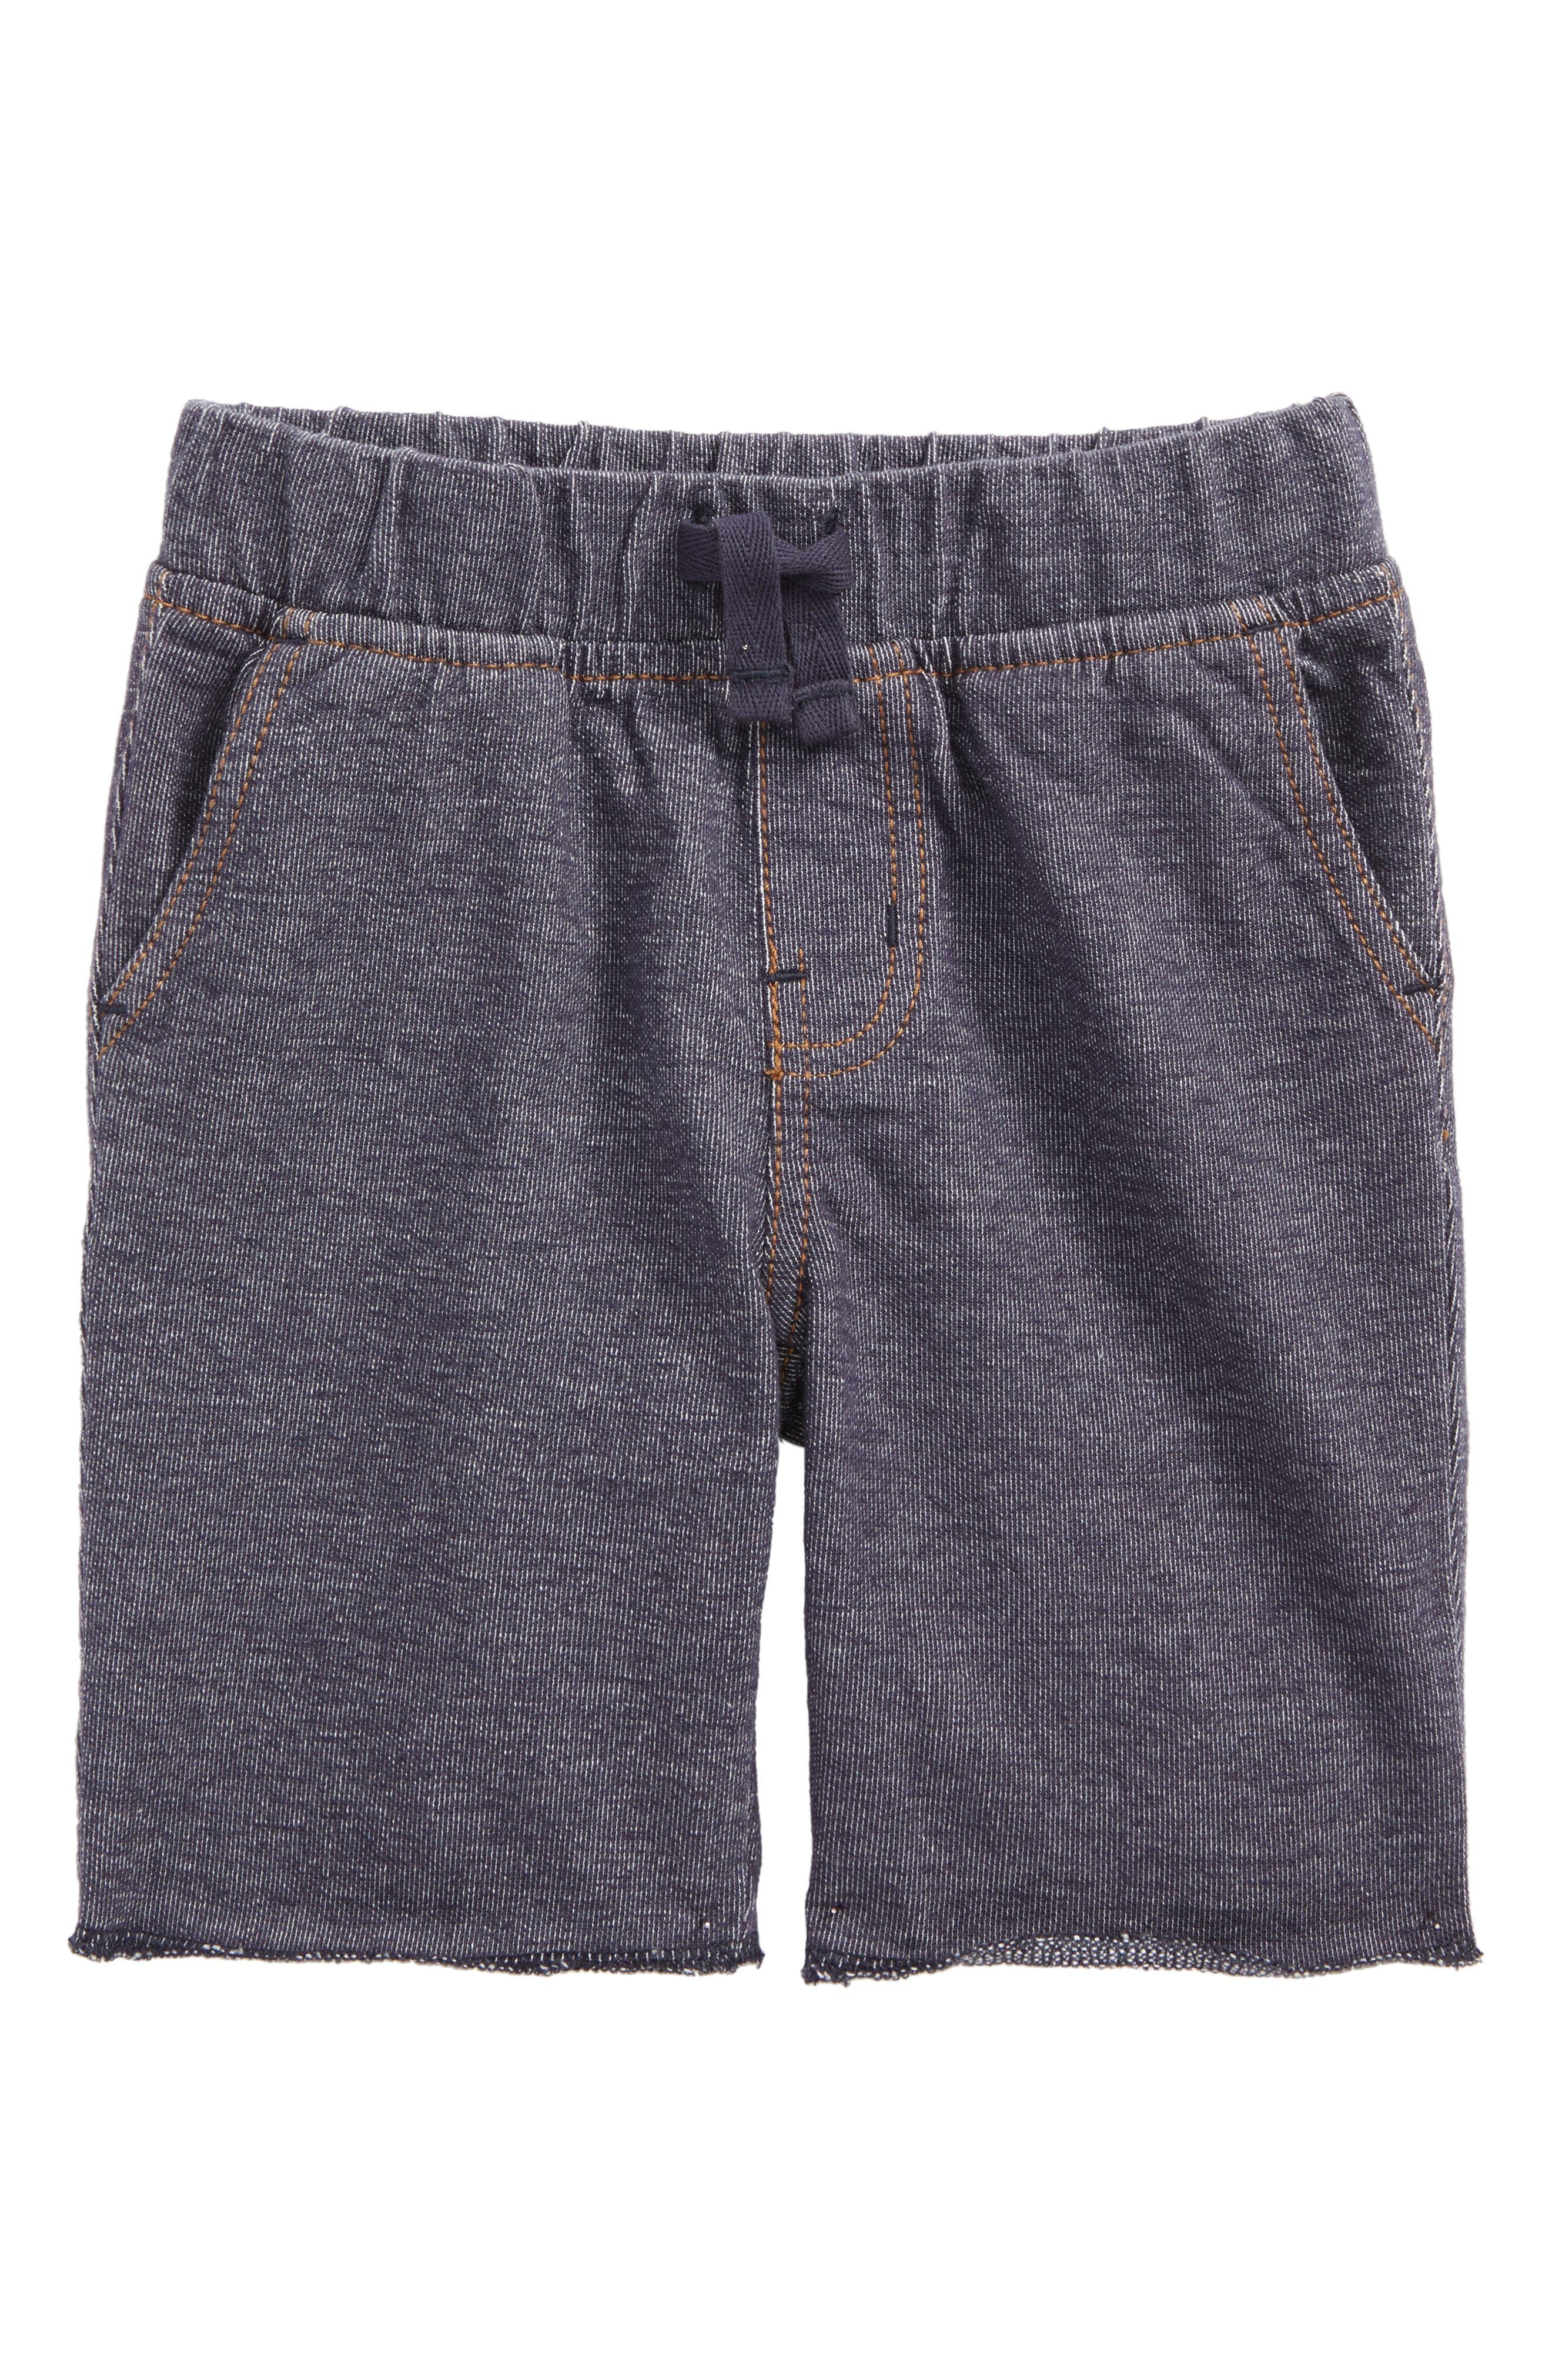 Shorts,                         Main,                         color, Indigo